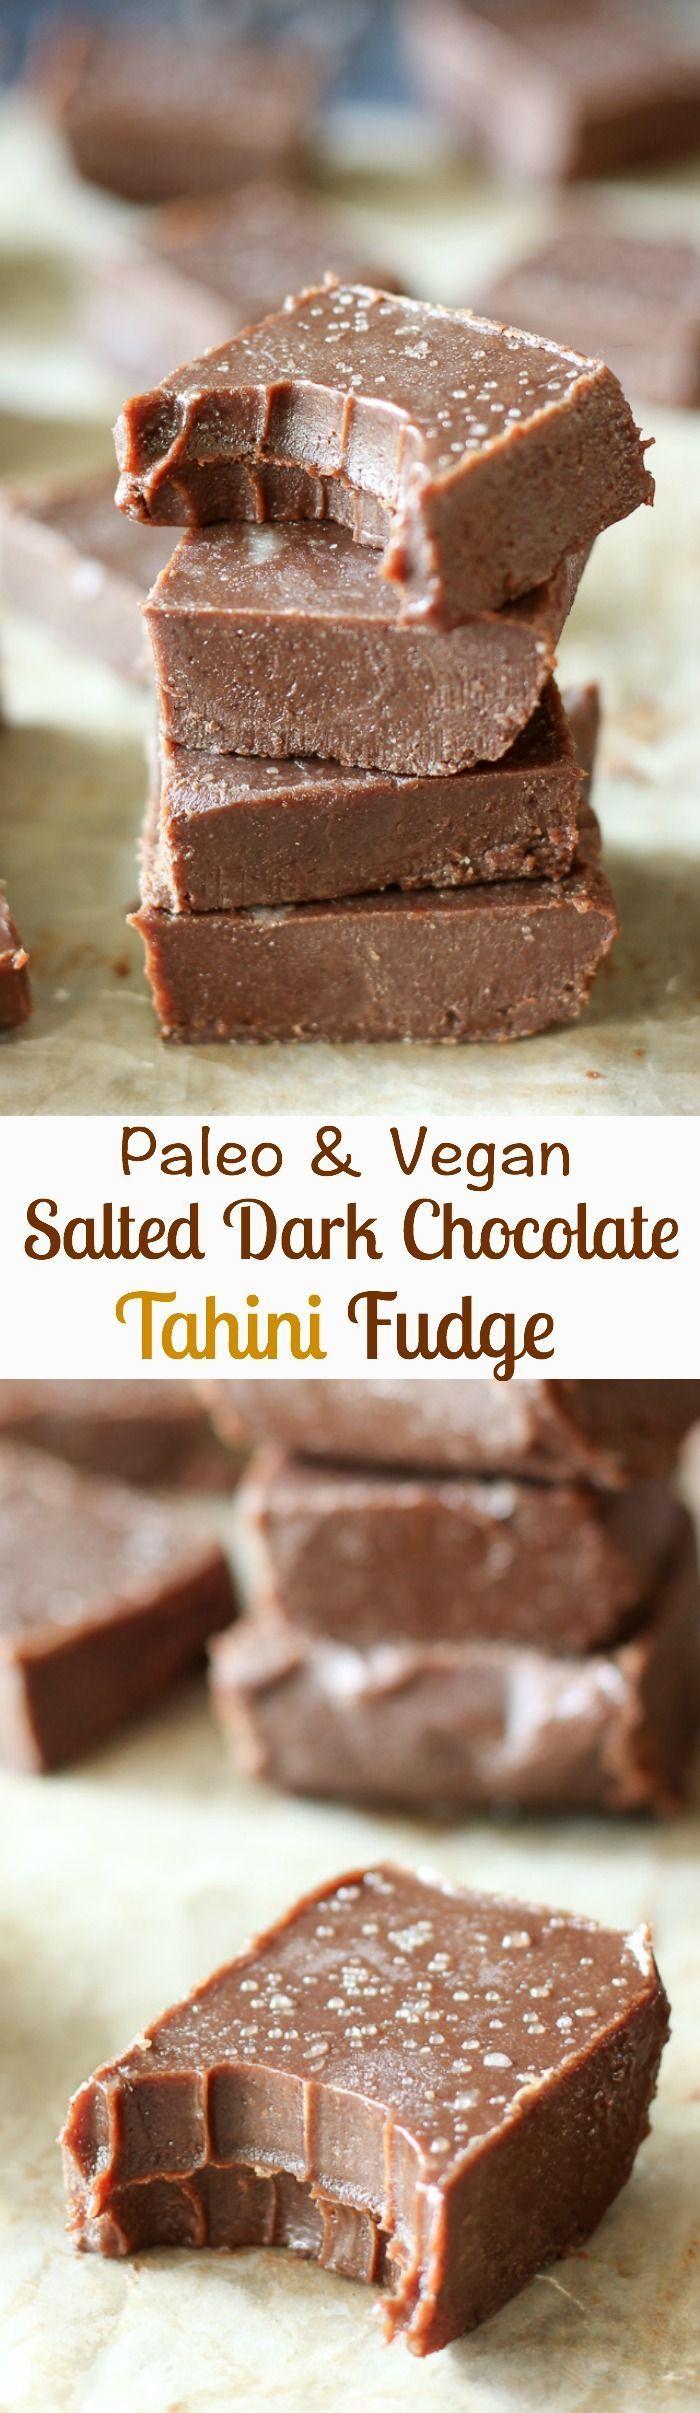 Paleo & Vegan salted dark chocolate tahini freezer fudge - rich chocolate flavor, creamy, so easy to make!